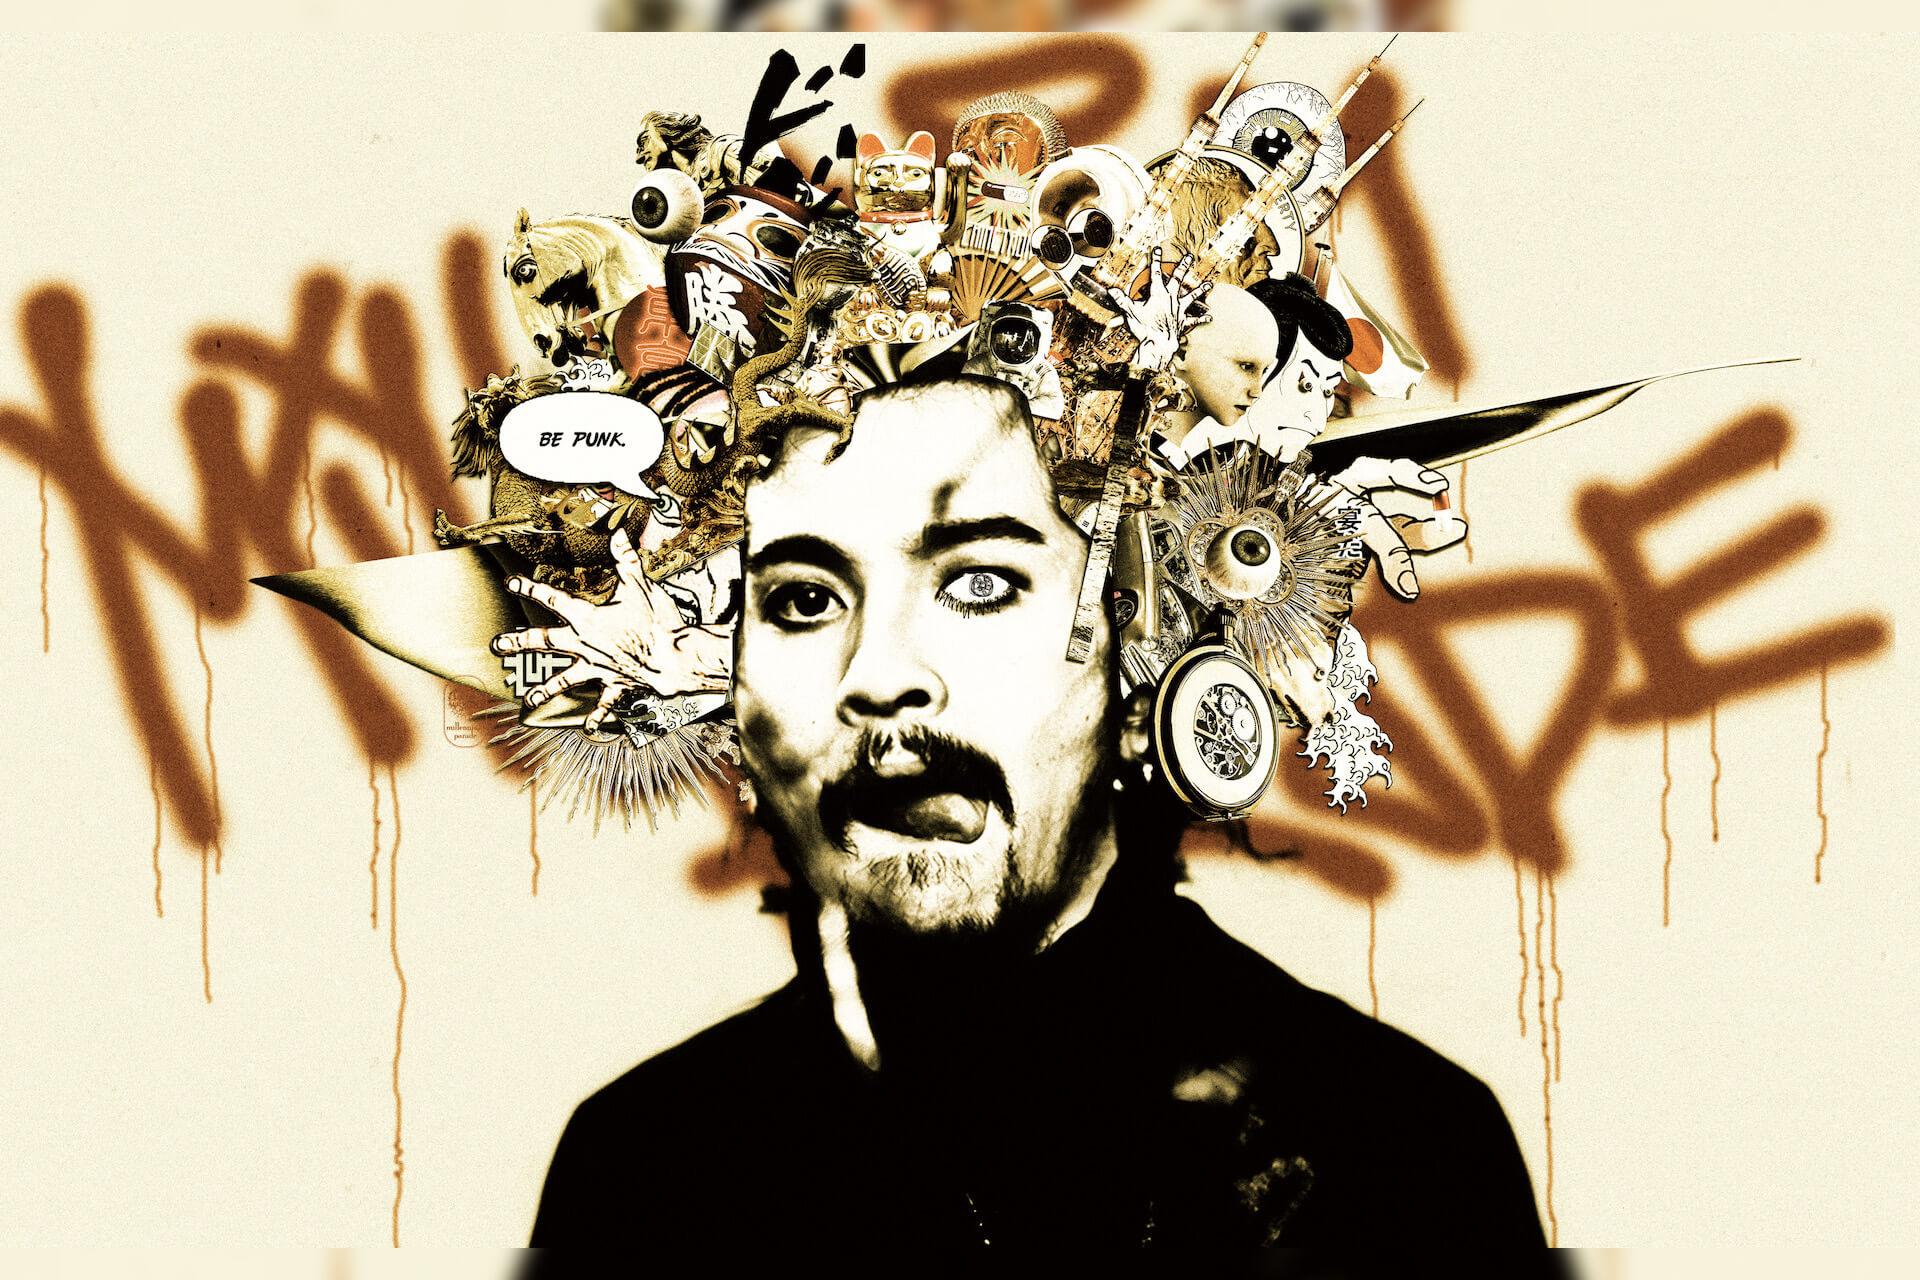 J-WAVE特別番組で m-flo、OKAMOTO'SがNetflix作品を熱く語る!King Gnu常田大希が『攻殻機動隊 SAC_2045』の魅力を紹介するコーナーも art200428_jwave_main